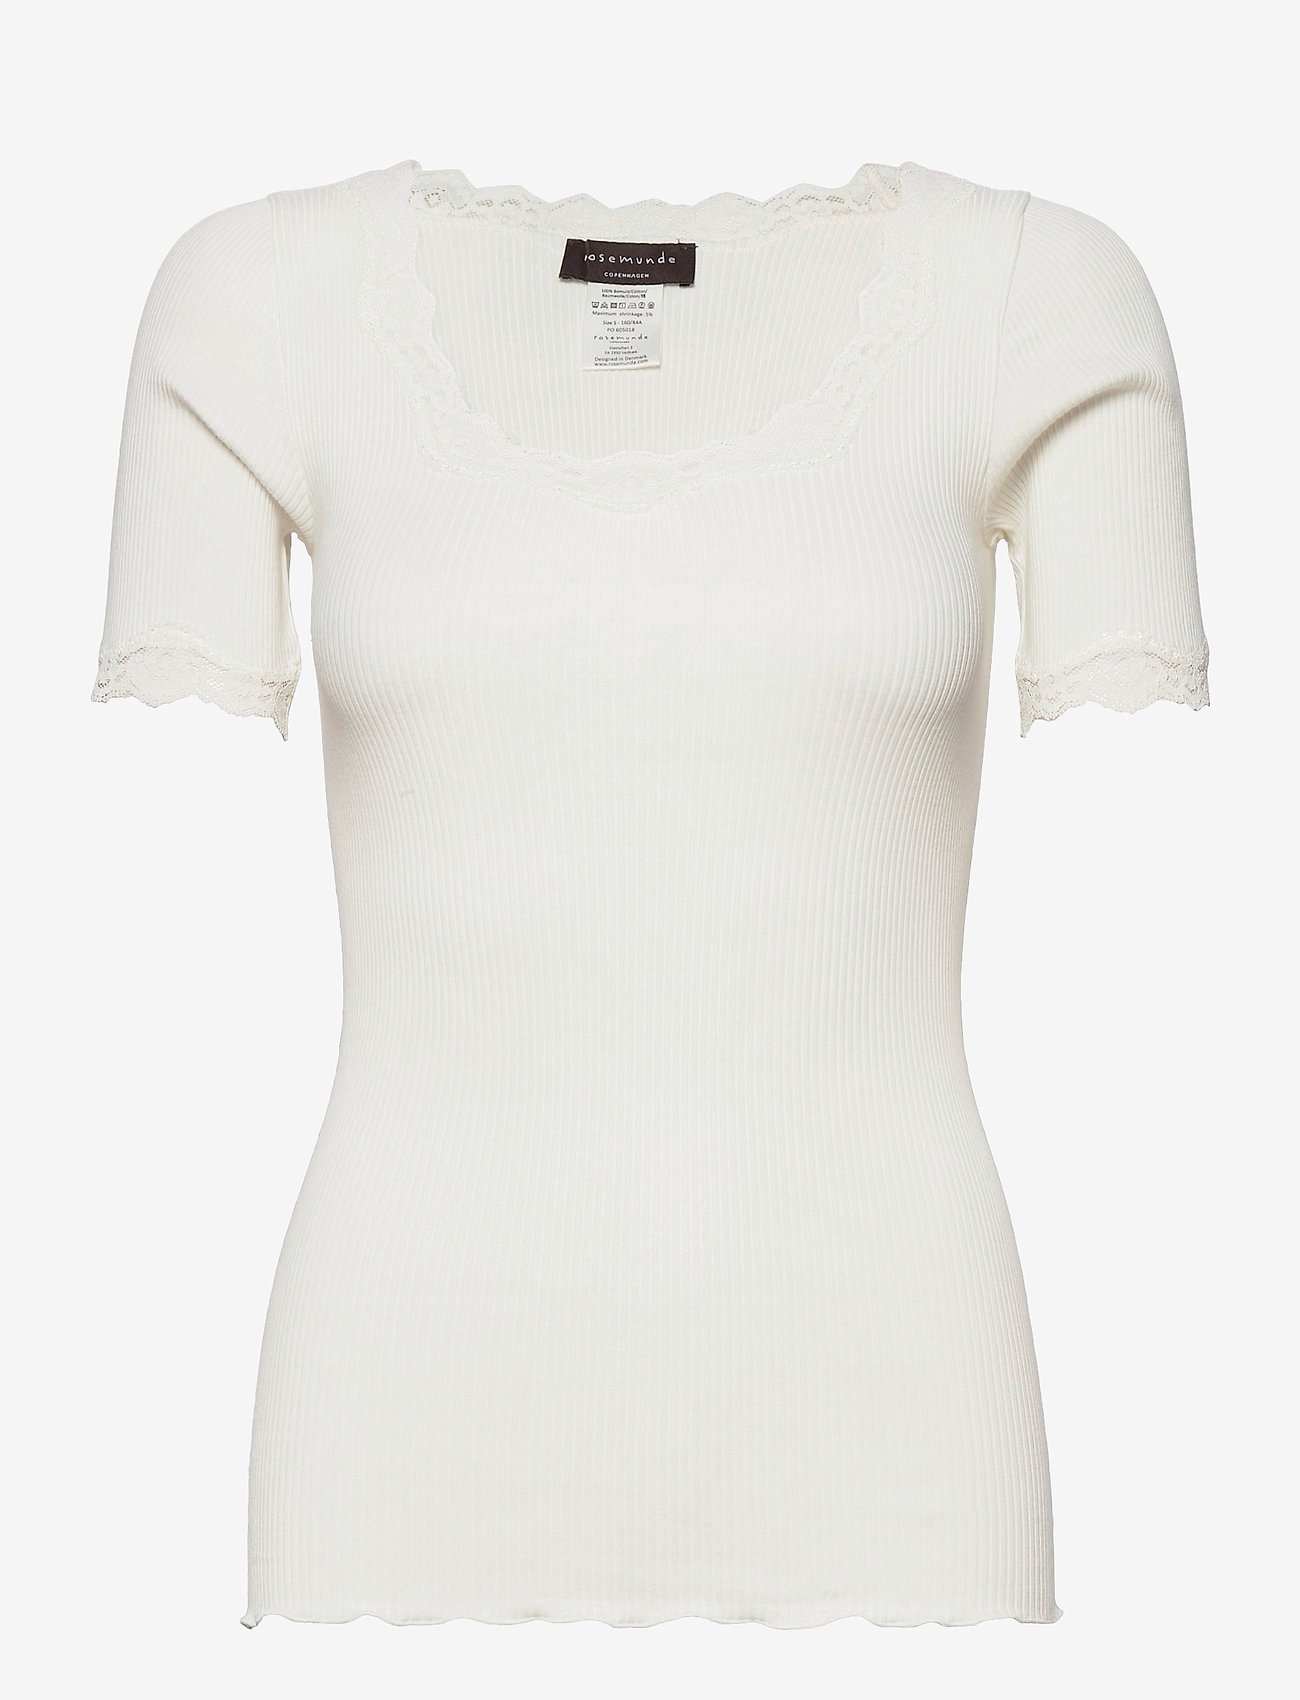 Rosemunde - Organic t-shirt regular ss w/ rev,v - t-shirts - ivory - 0